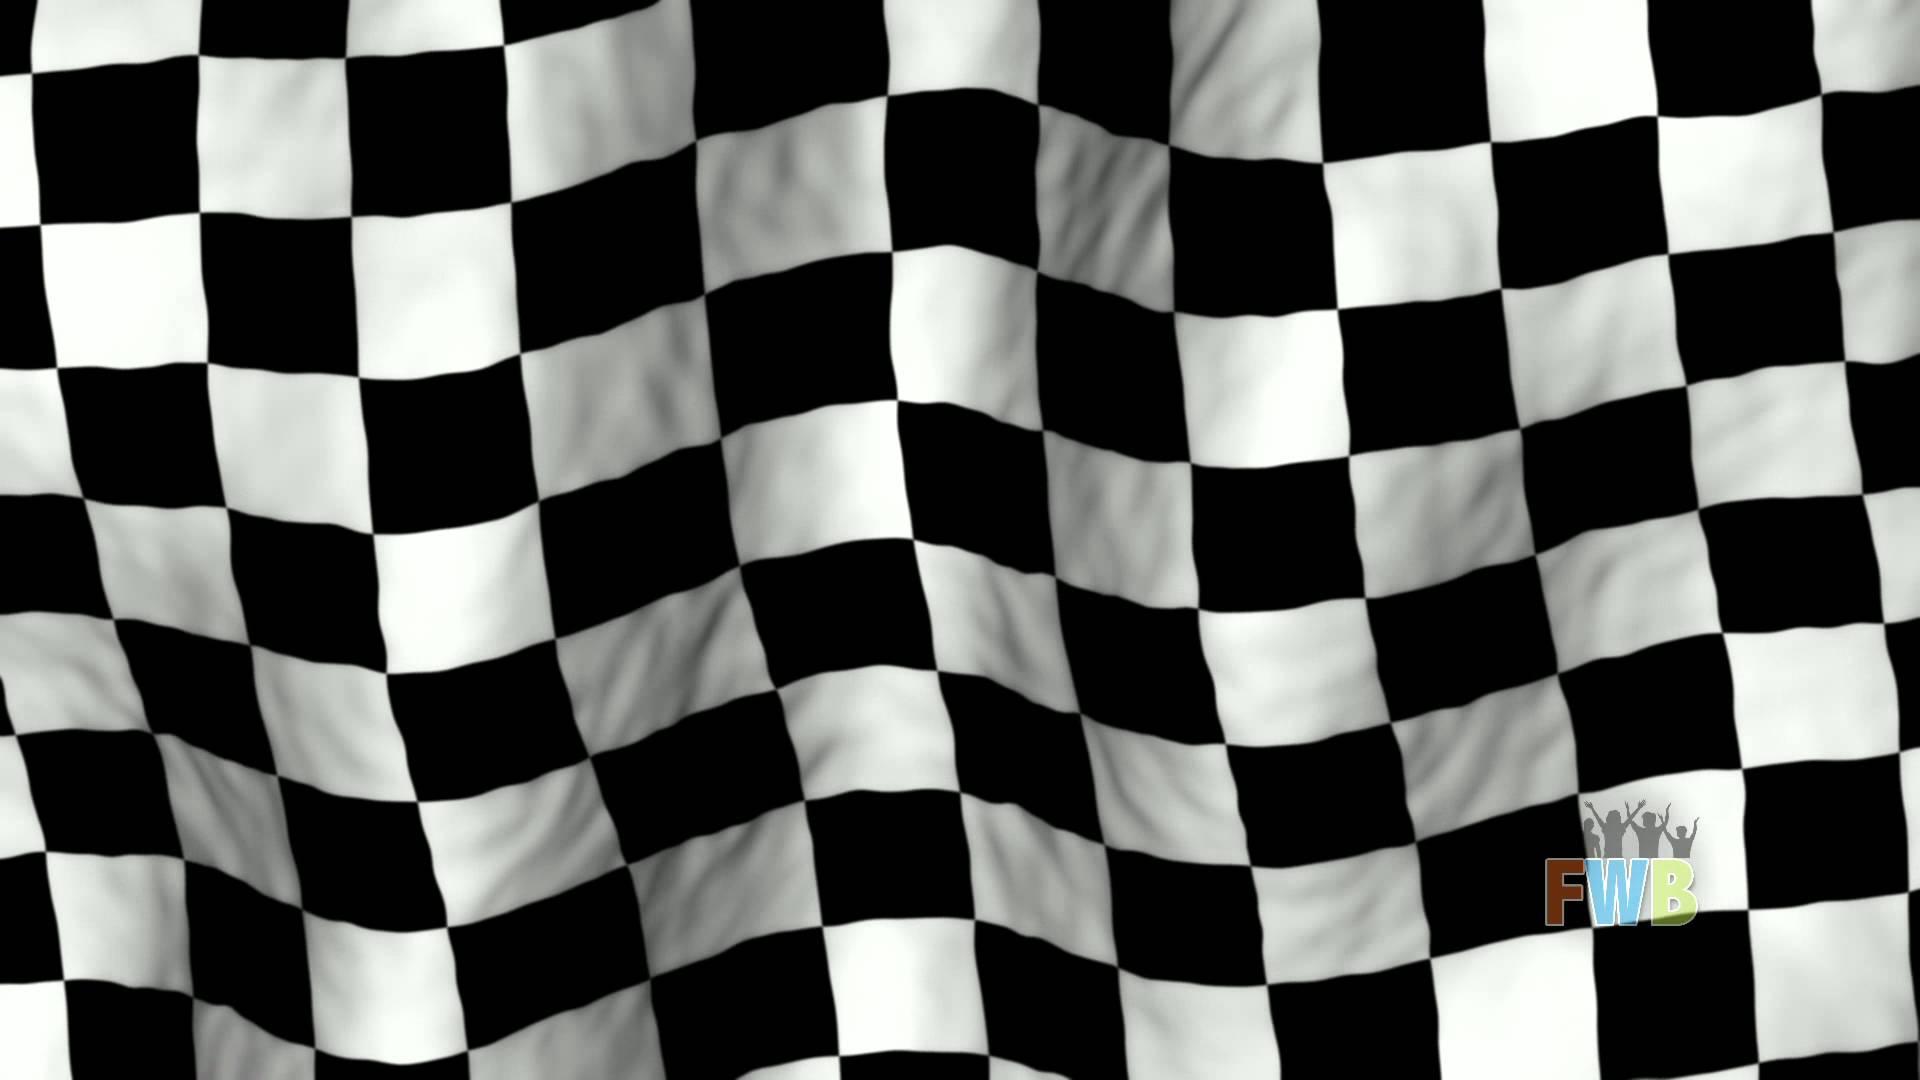 Dfovoi in addition White Ivy Hi also Orange Cool Border Hi besides Xuvc H in addition Jusen. on black checkered border